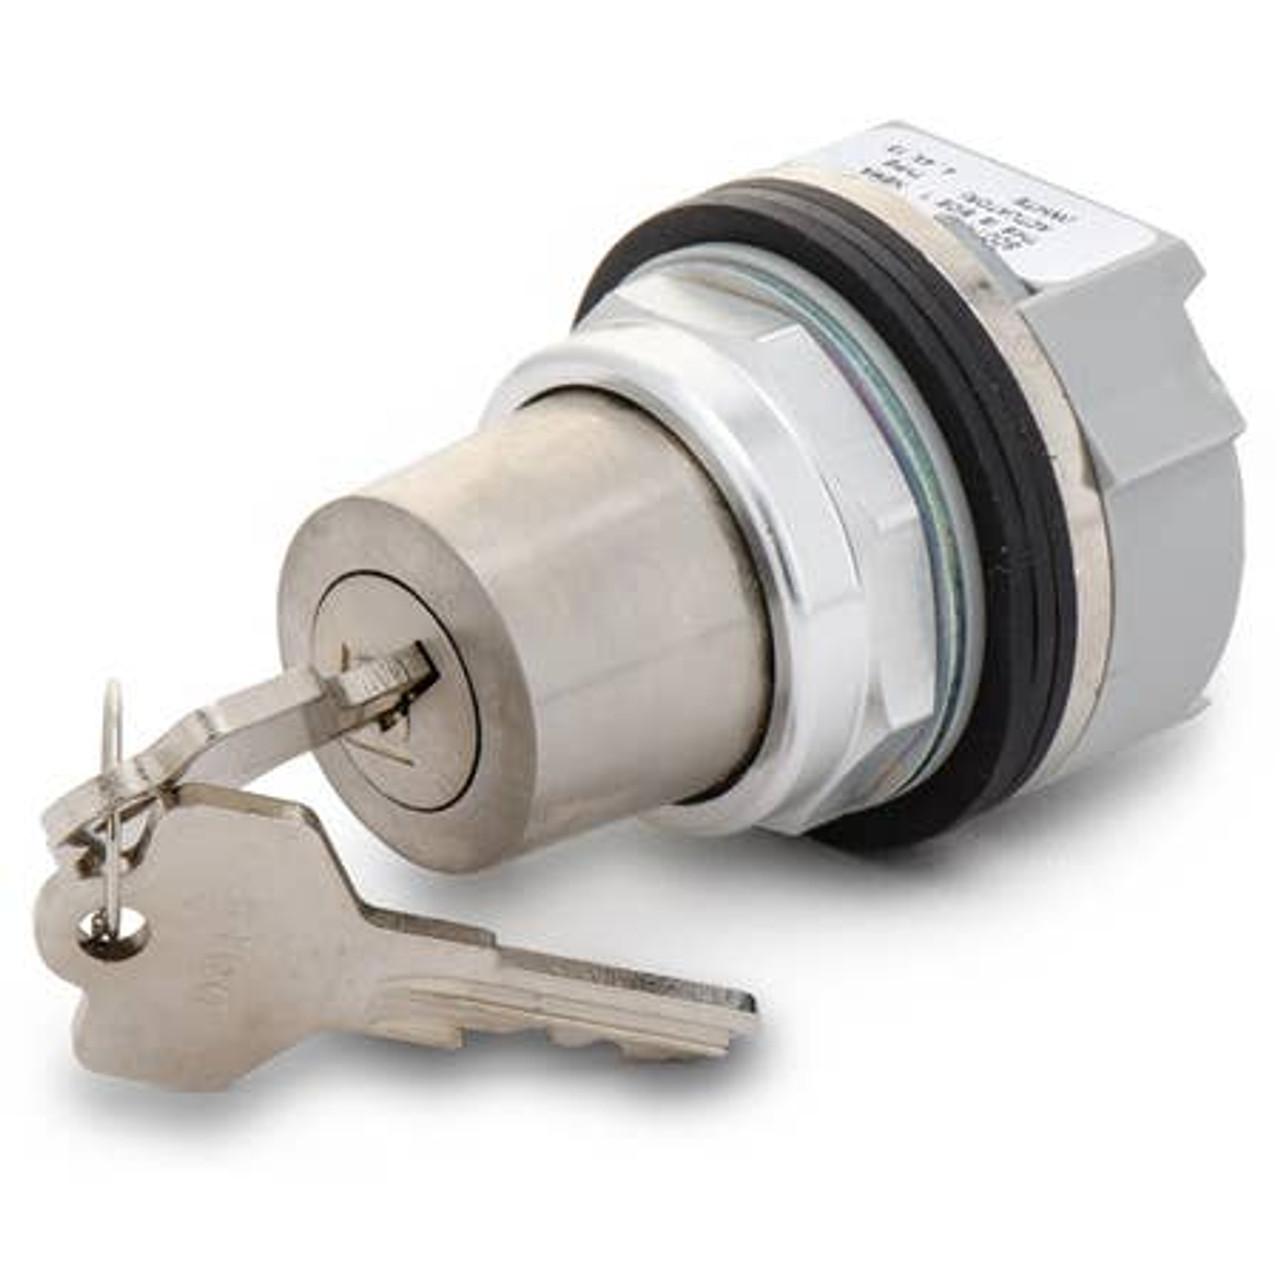 Allen Bradley selector switch compact 30.5mm size three position cylinder lock lock all standard key meet nema 4/13 enclosure.